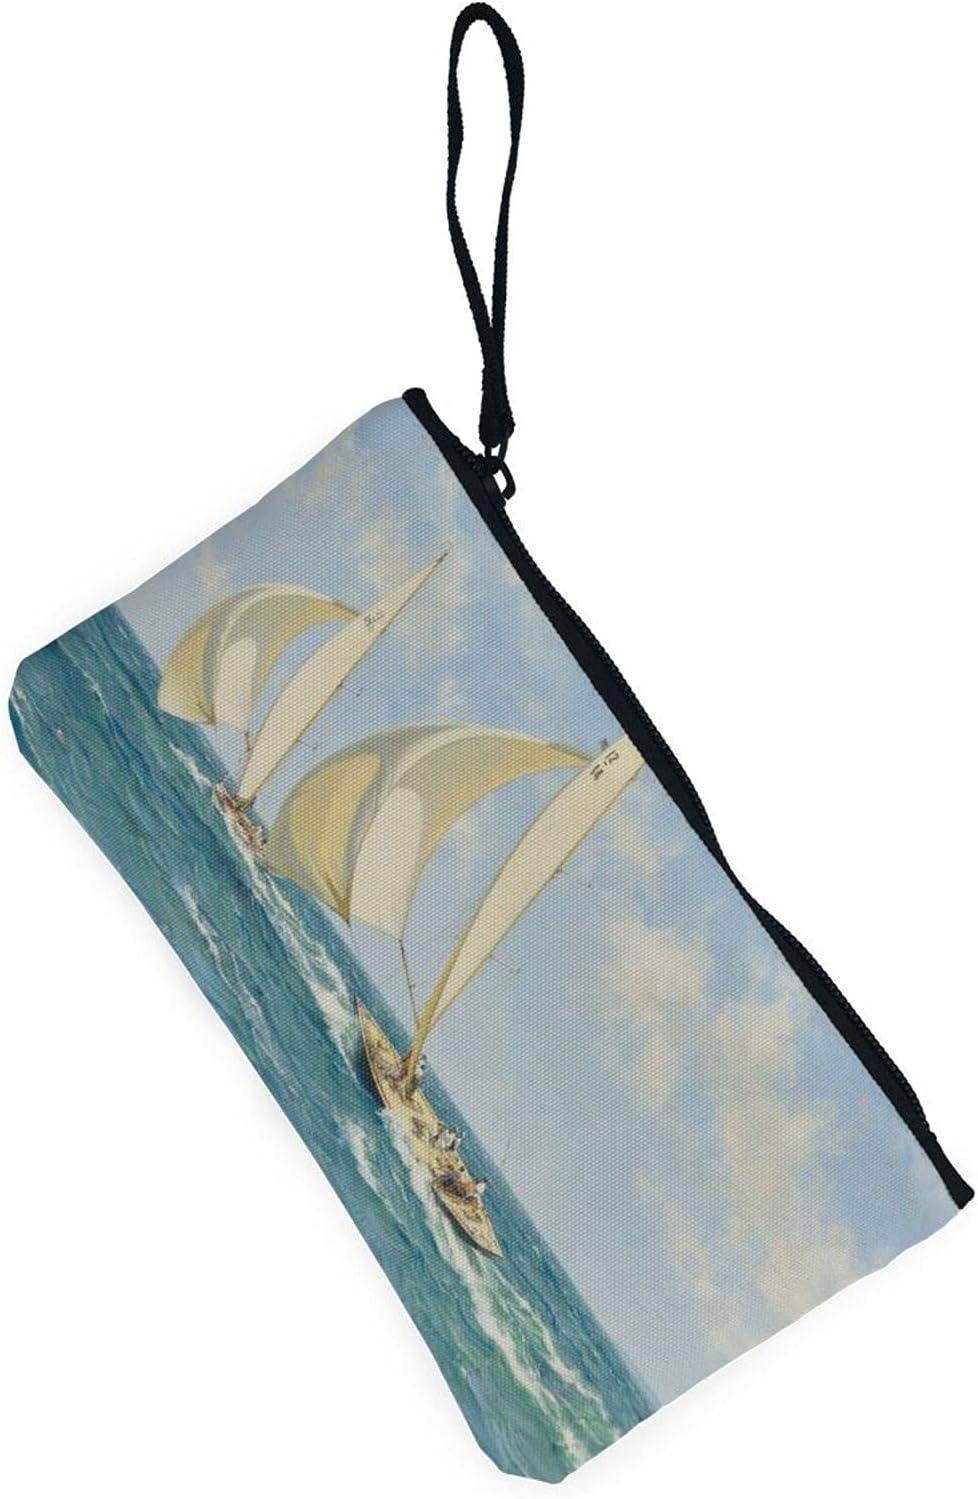 AORRUAM Sailboat Ship Canvas Coin Purse,Canvas Zipper Pencil Cases,Canvas Change Purse Pouch Mini Wallet Coin Bag